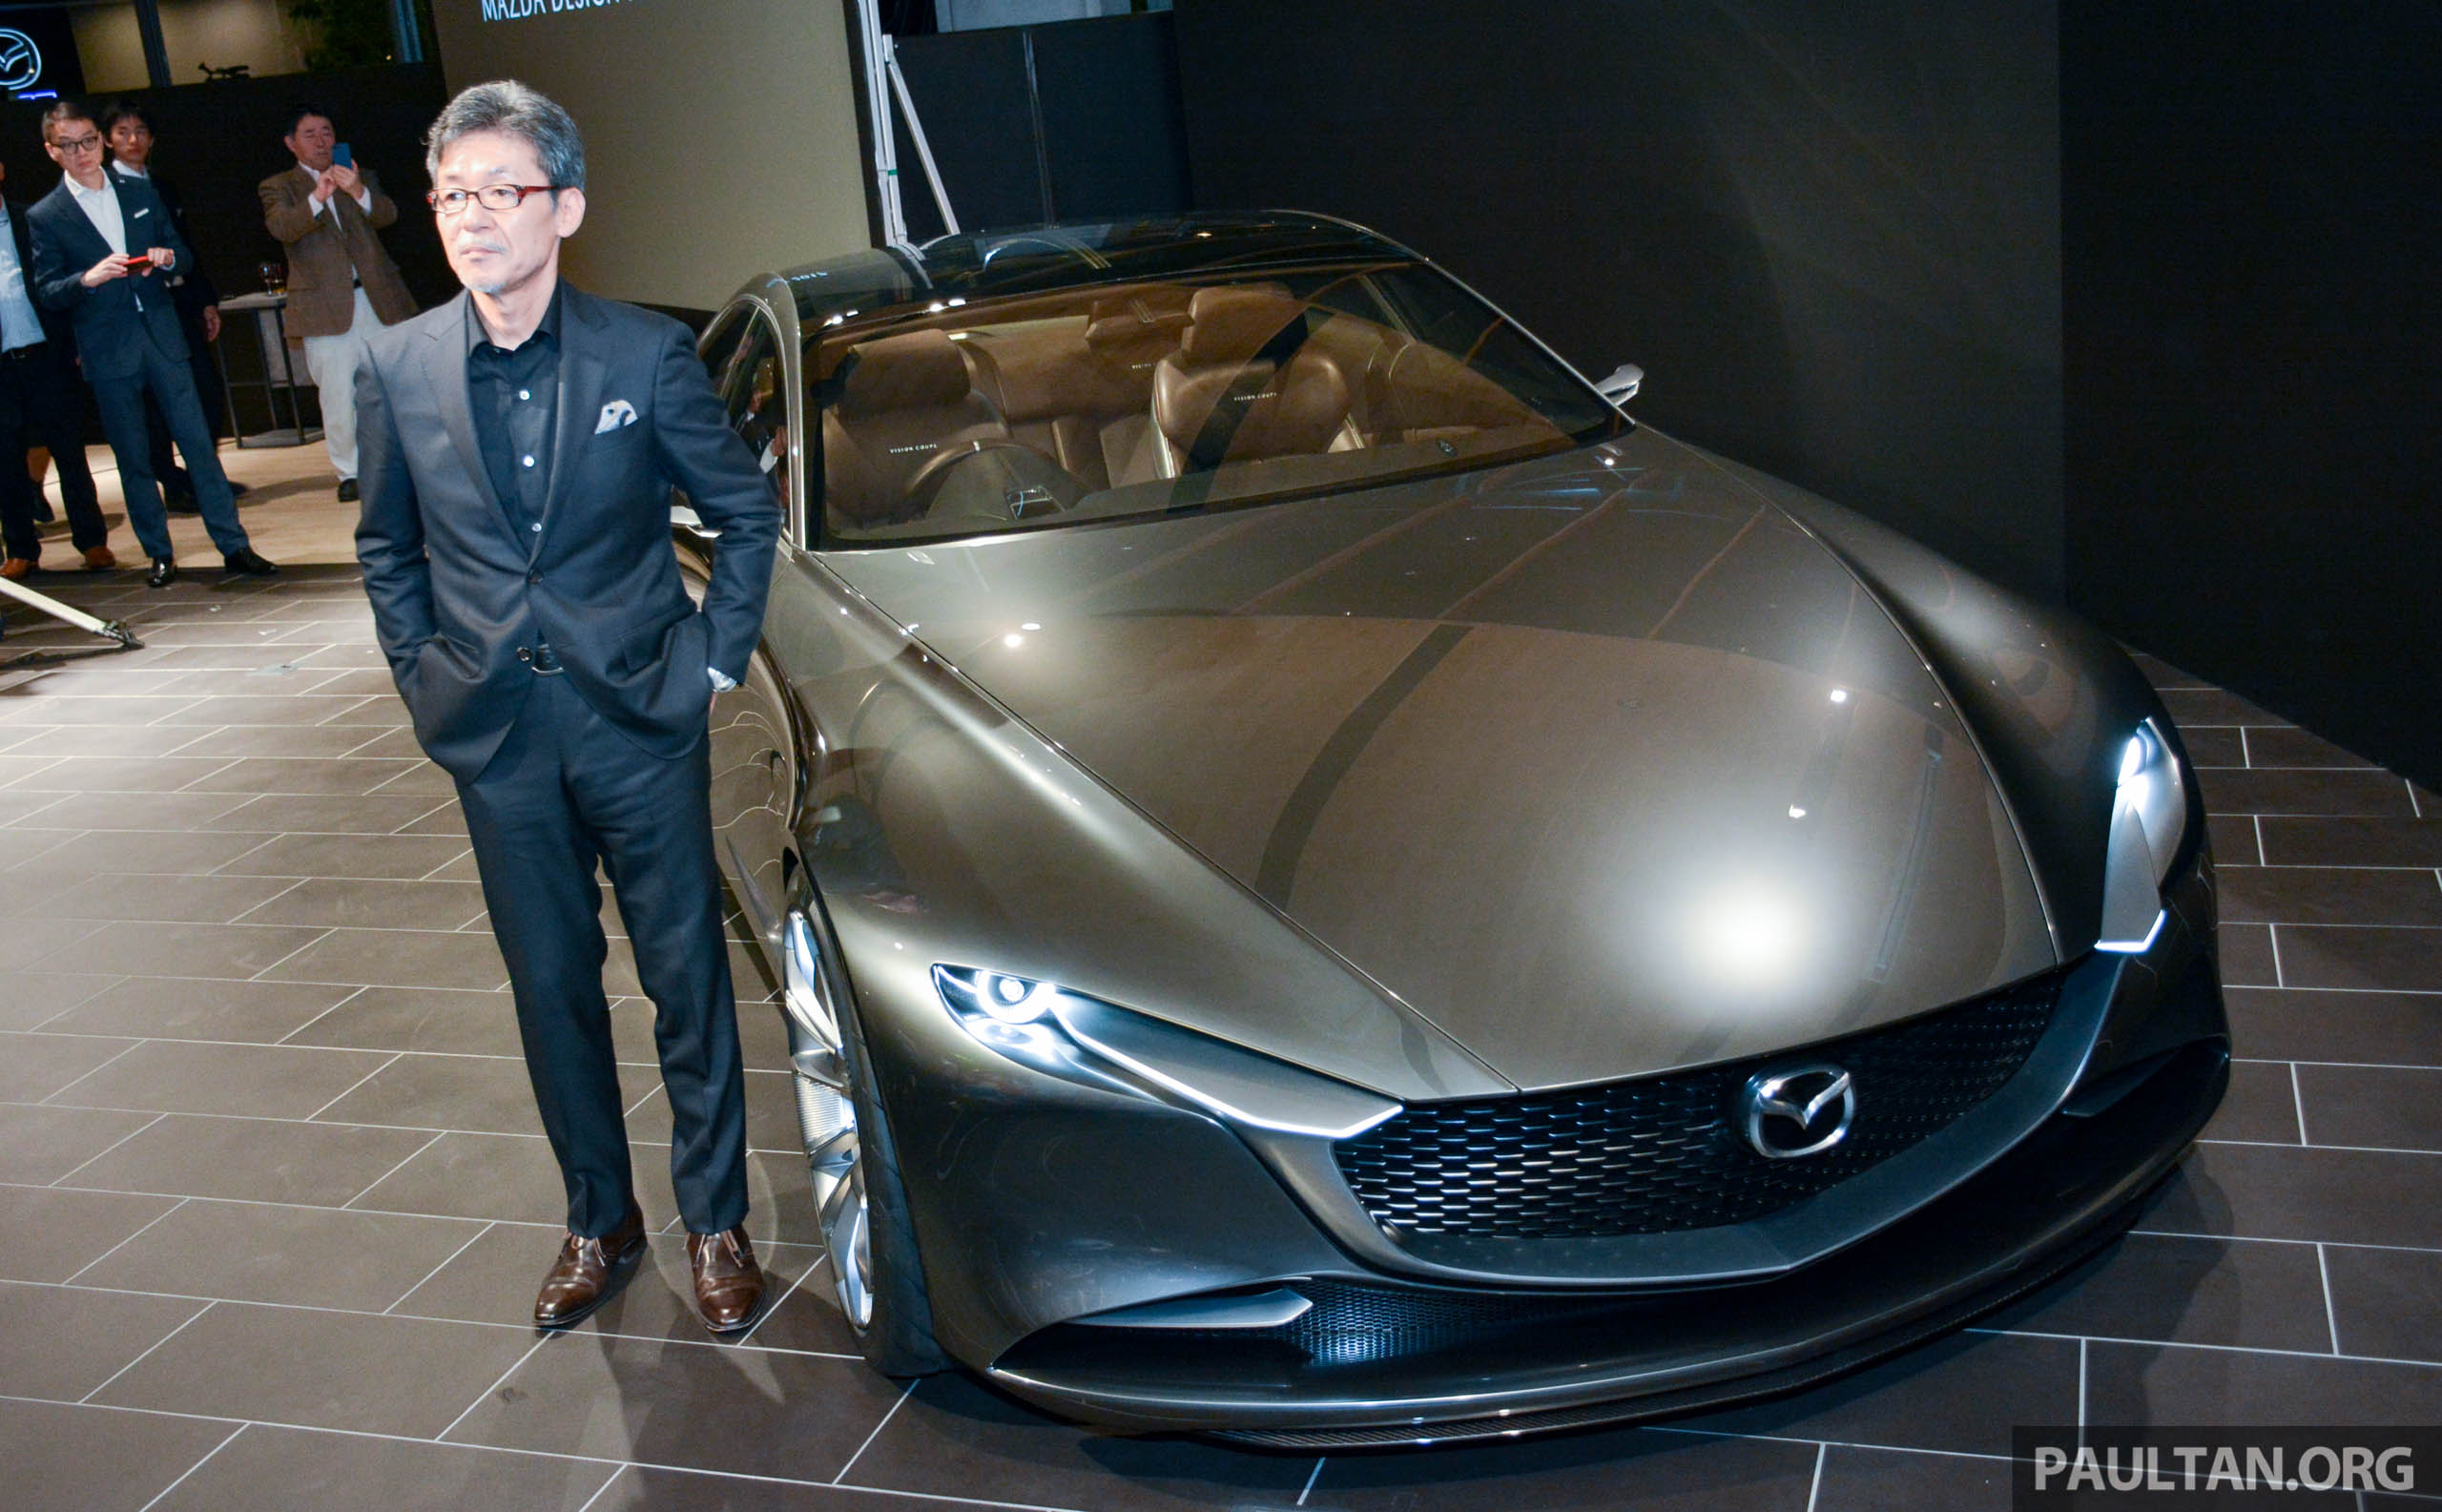 https://s2.paultan.org/image/2017/10/Mazda-Vision-Coupe-design-forum-28.jpg